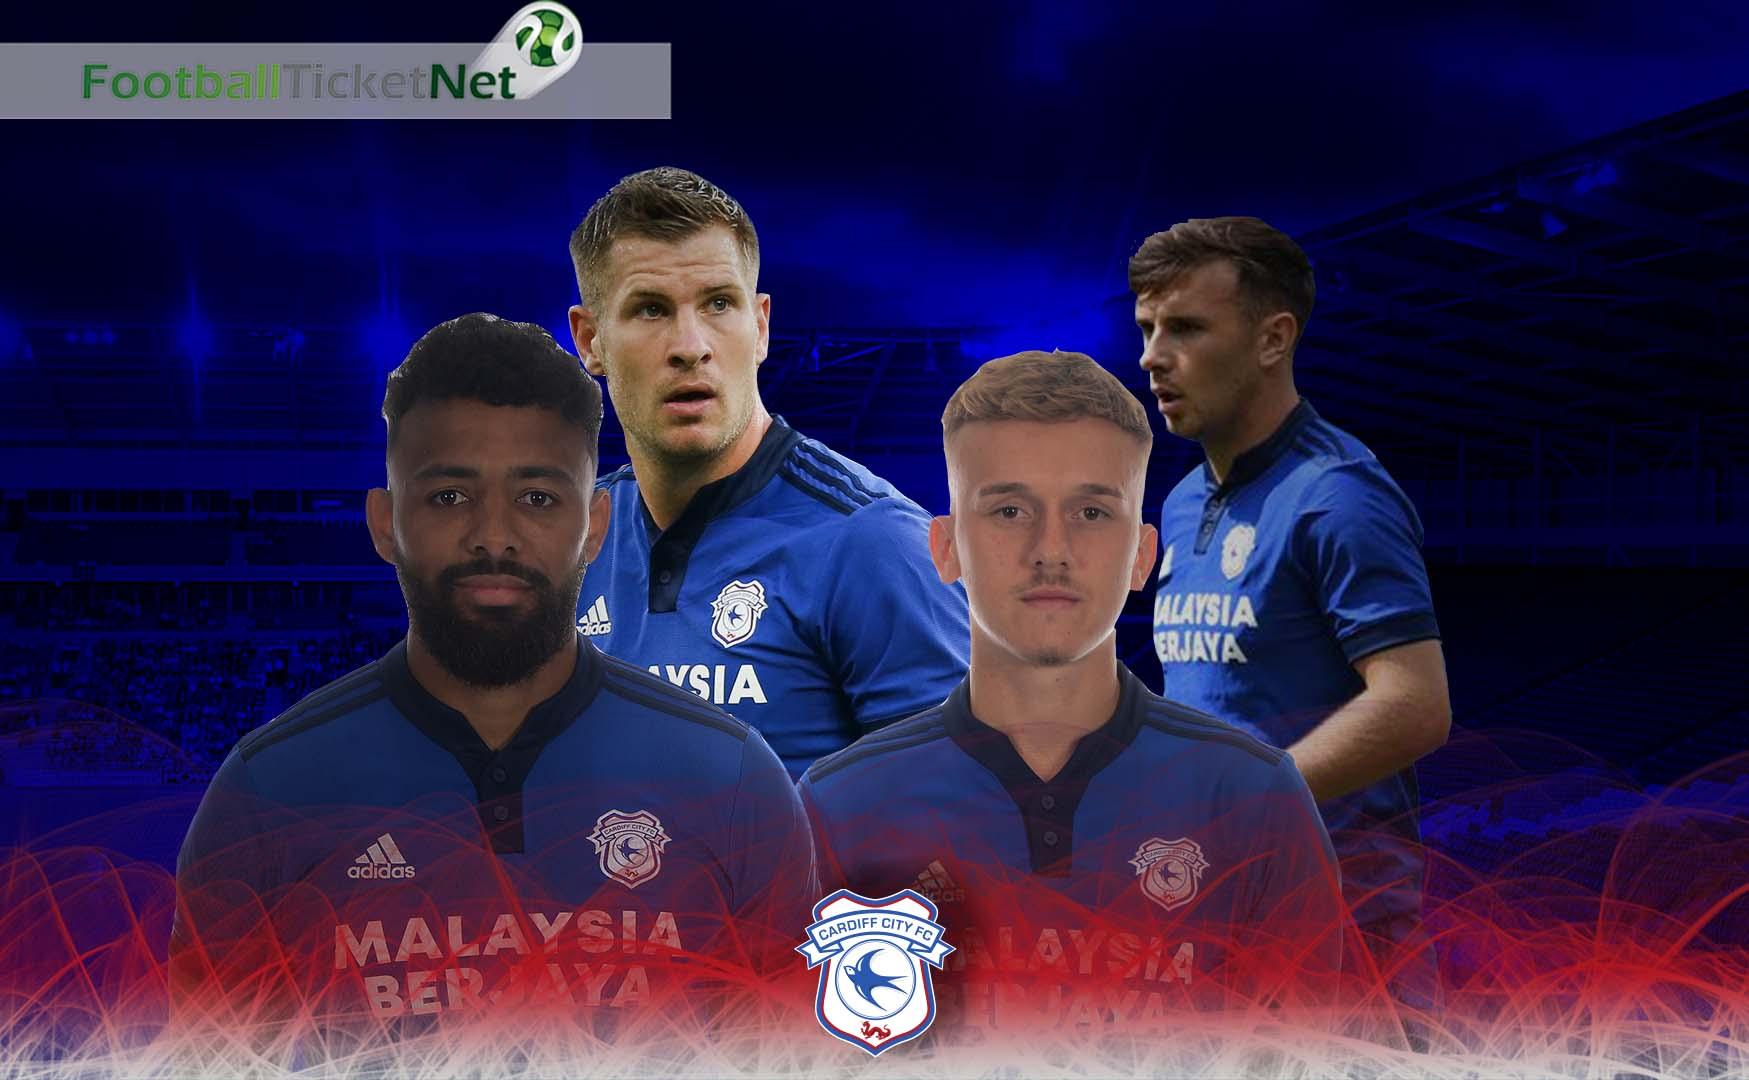 Buy Cardiff City Football Tickets 2019 20 Football Ticket Net